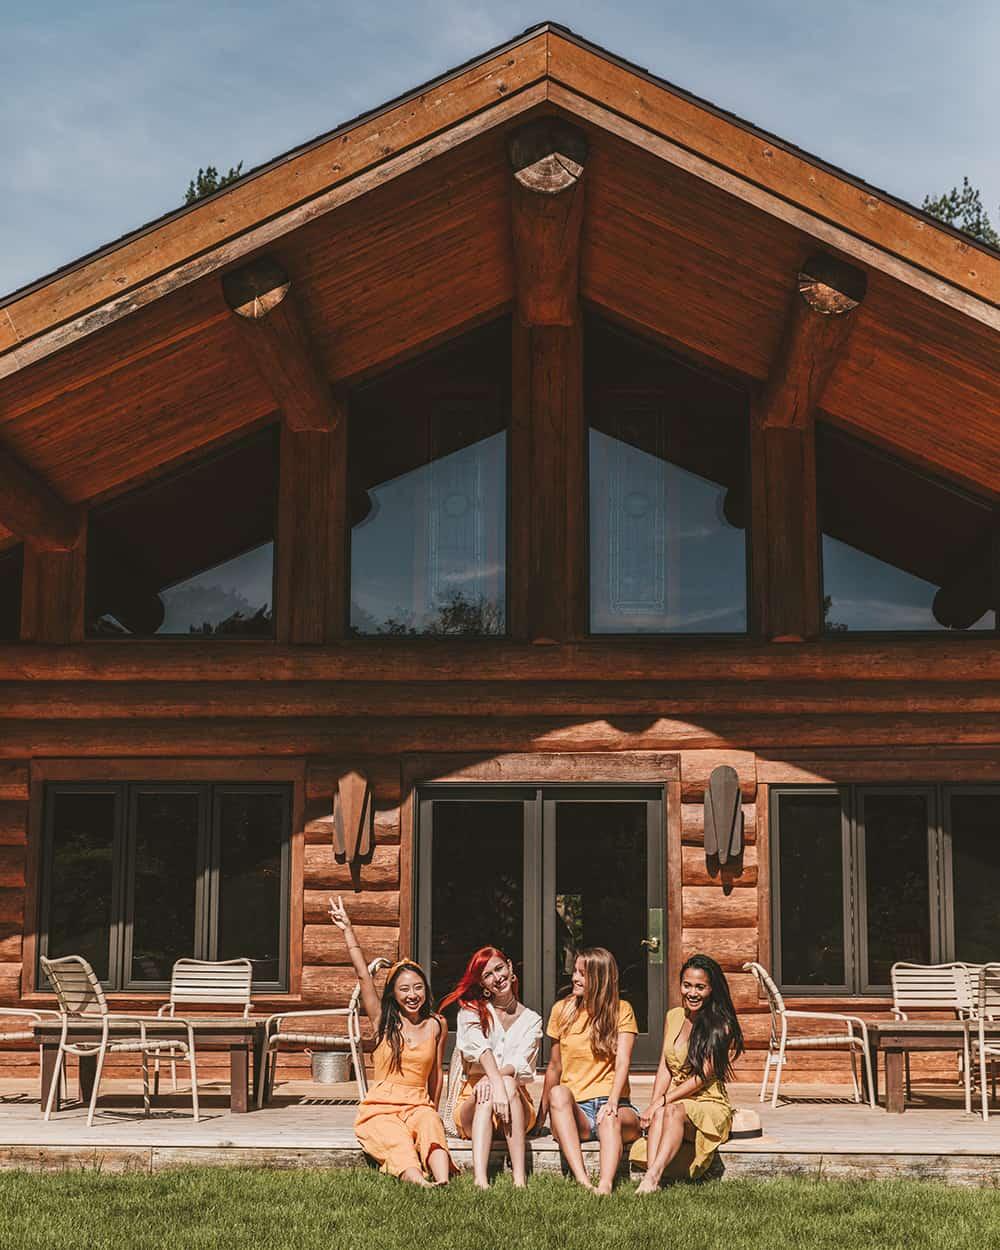 Barothy Lodge in Ludington, Michigan